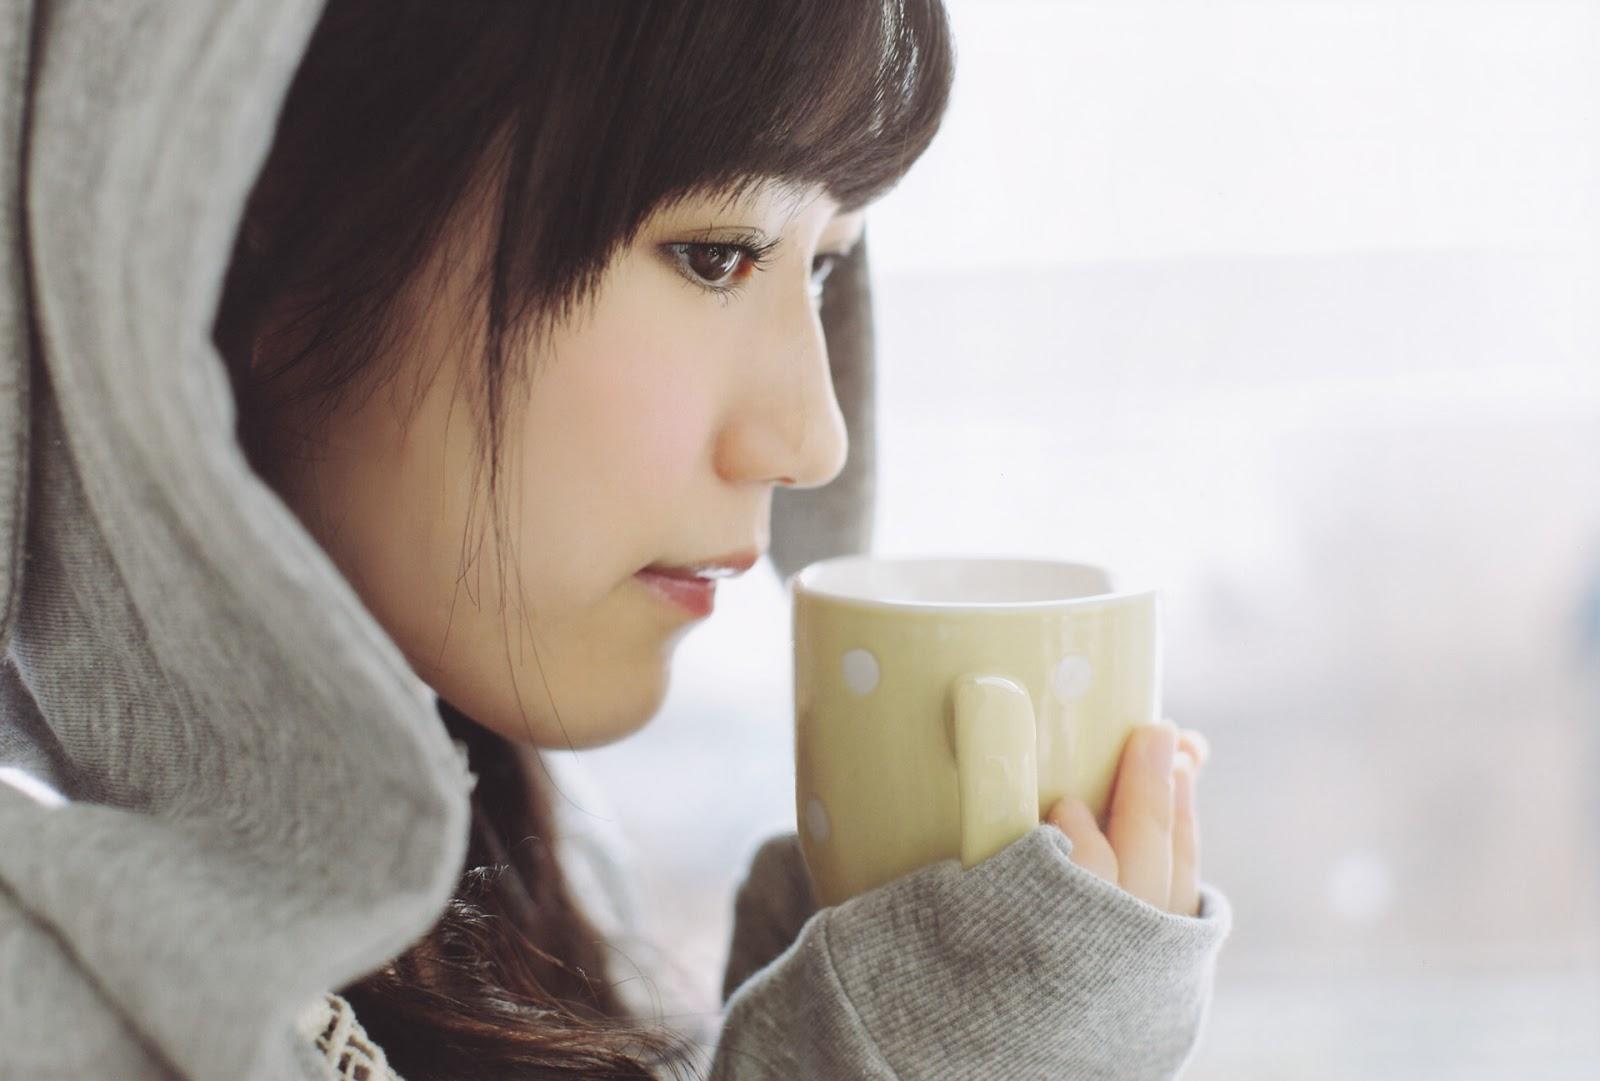 http://4.bp.blogspot.com/-8rZryNRGDMA/UTHdtSyv9QI/AAAAAAAAe9U/qUVxKwAggVU/s1600/AKB48+Watanabe+Mayu+%E6%B8%A1%E8%BE%BA%E9%BA%BB%E5%8F%8B+Wallpaper+HD.jpg